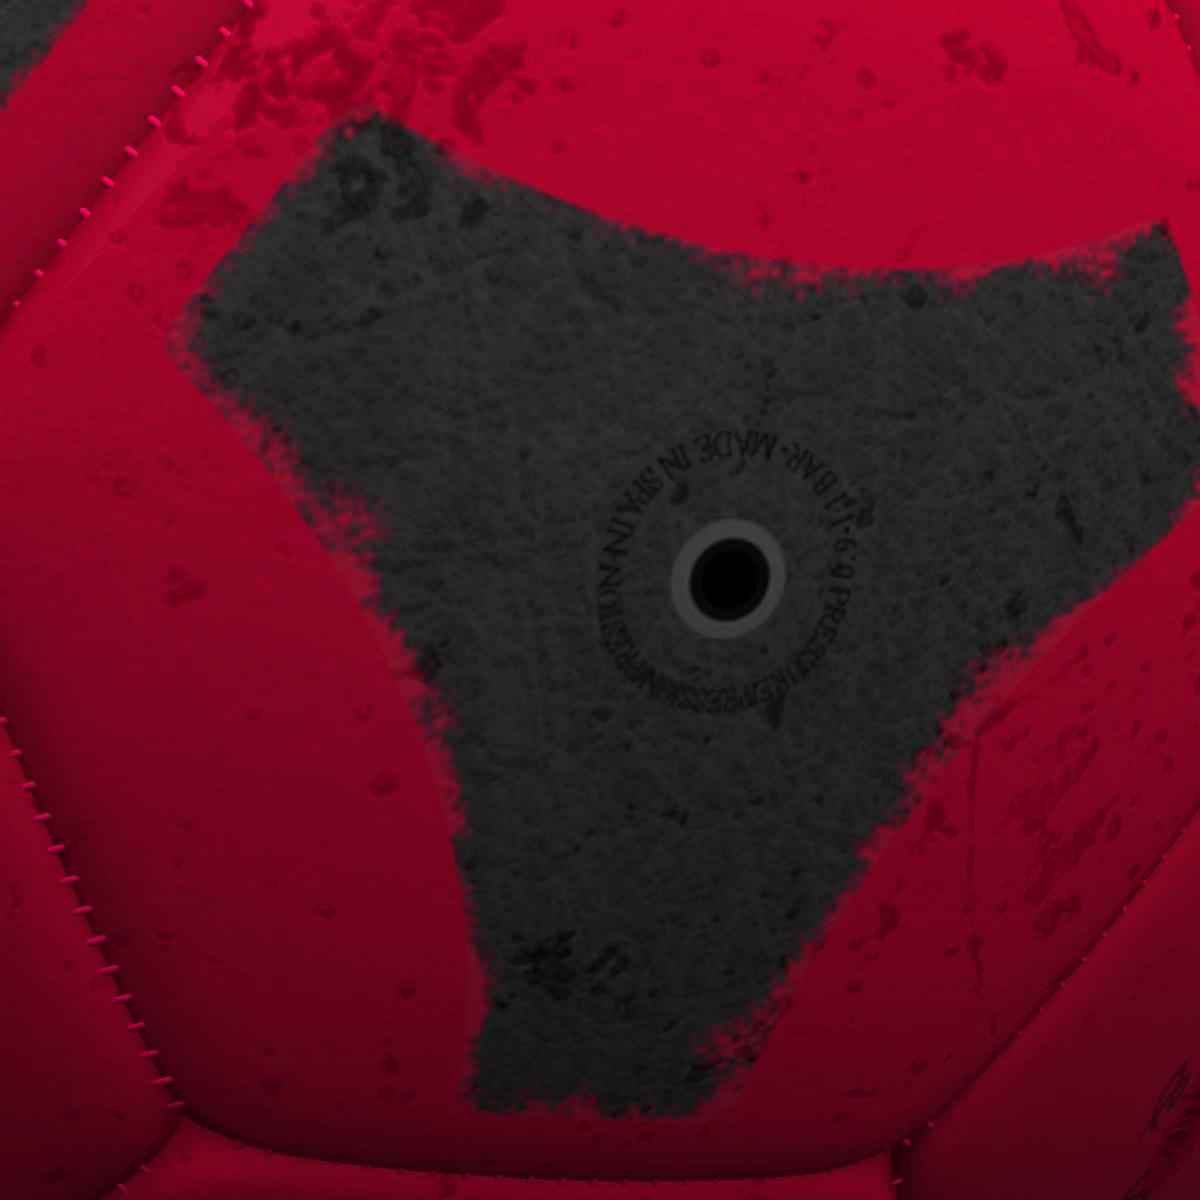 soccerball red black 3d model 3ds max fbx c4d ma mb obj 204549